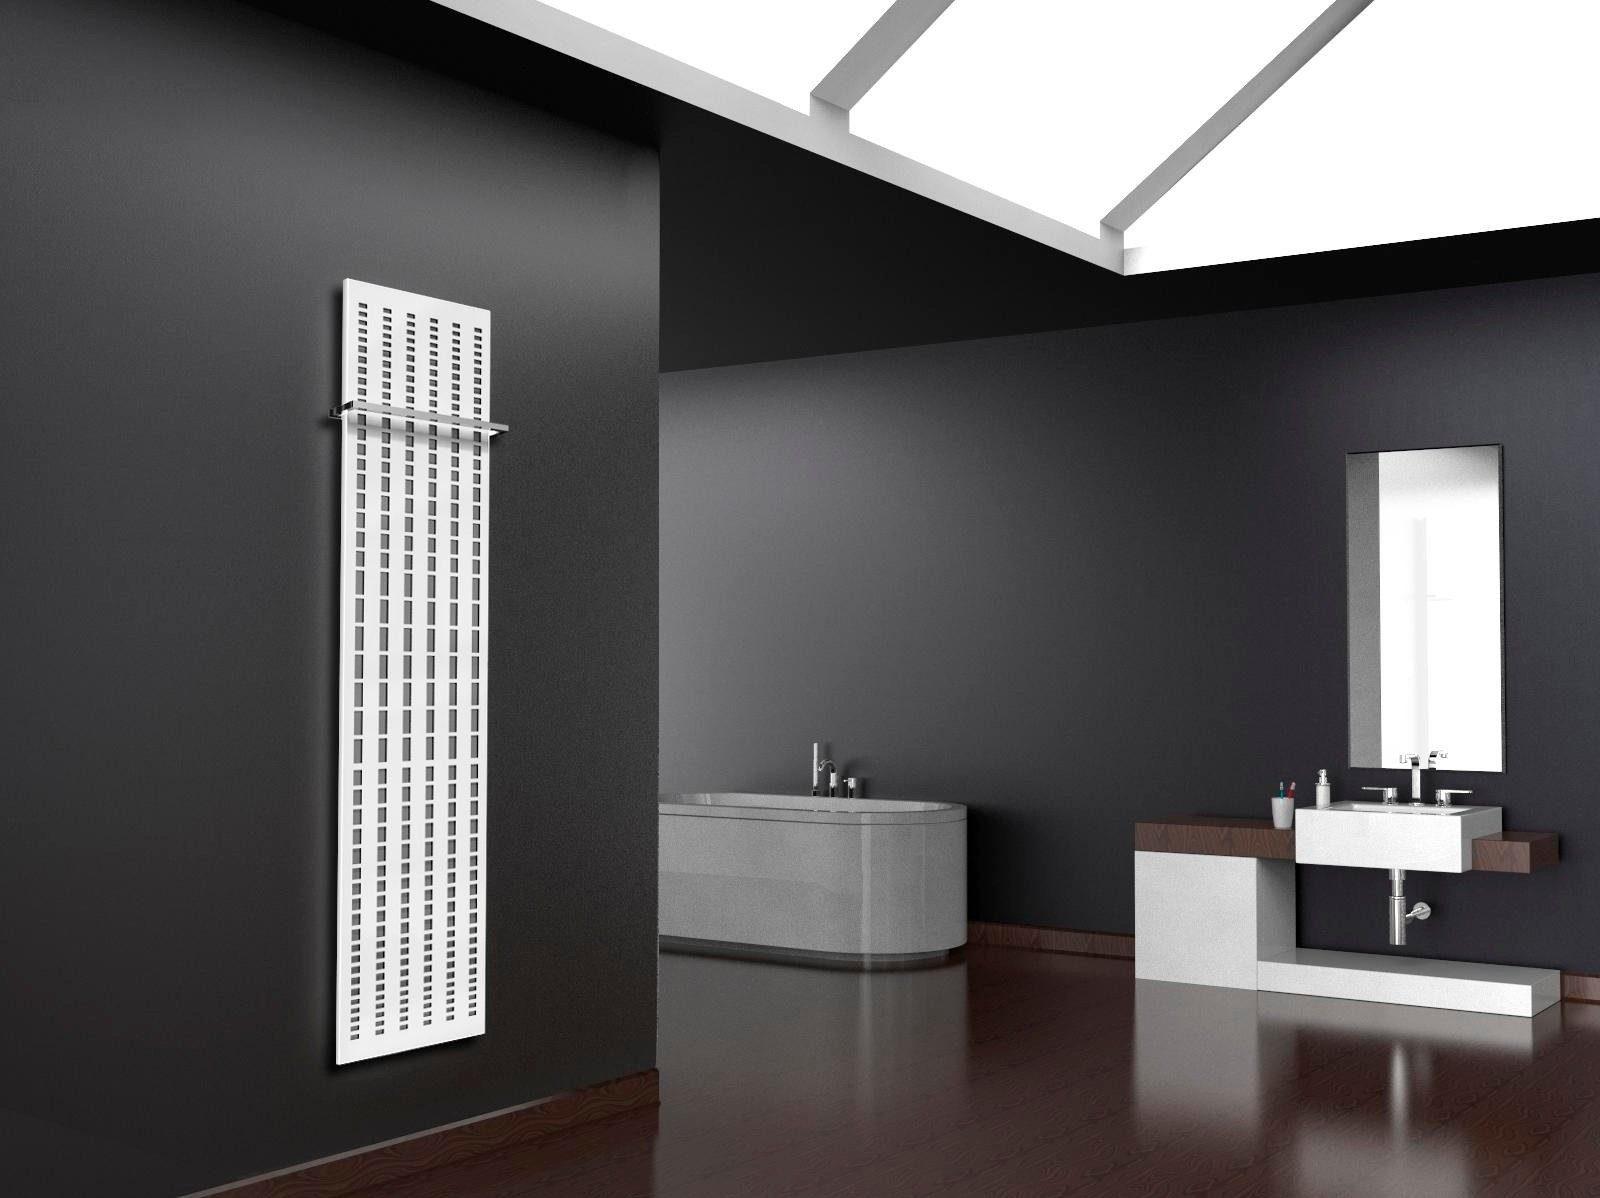 Sz Metall Design-Badheizkörper »Broken Mirror« in edelstahl-weiß, 1118 Watt